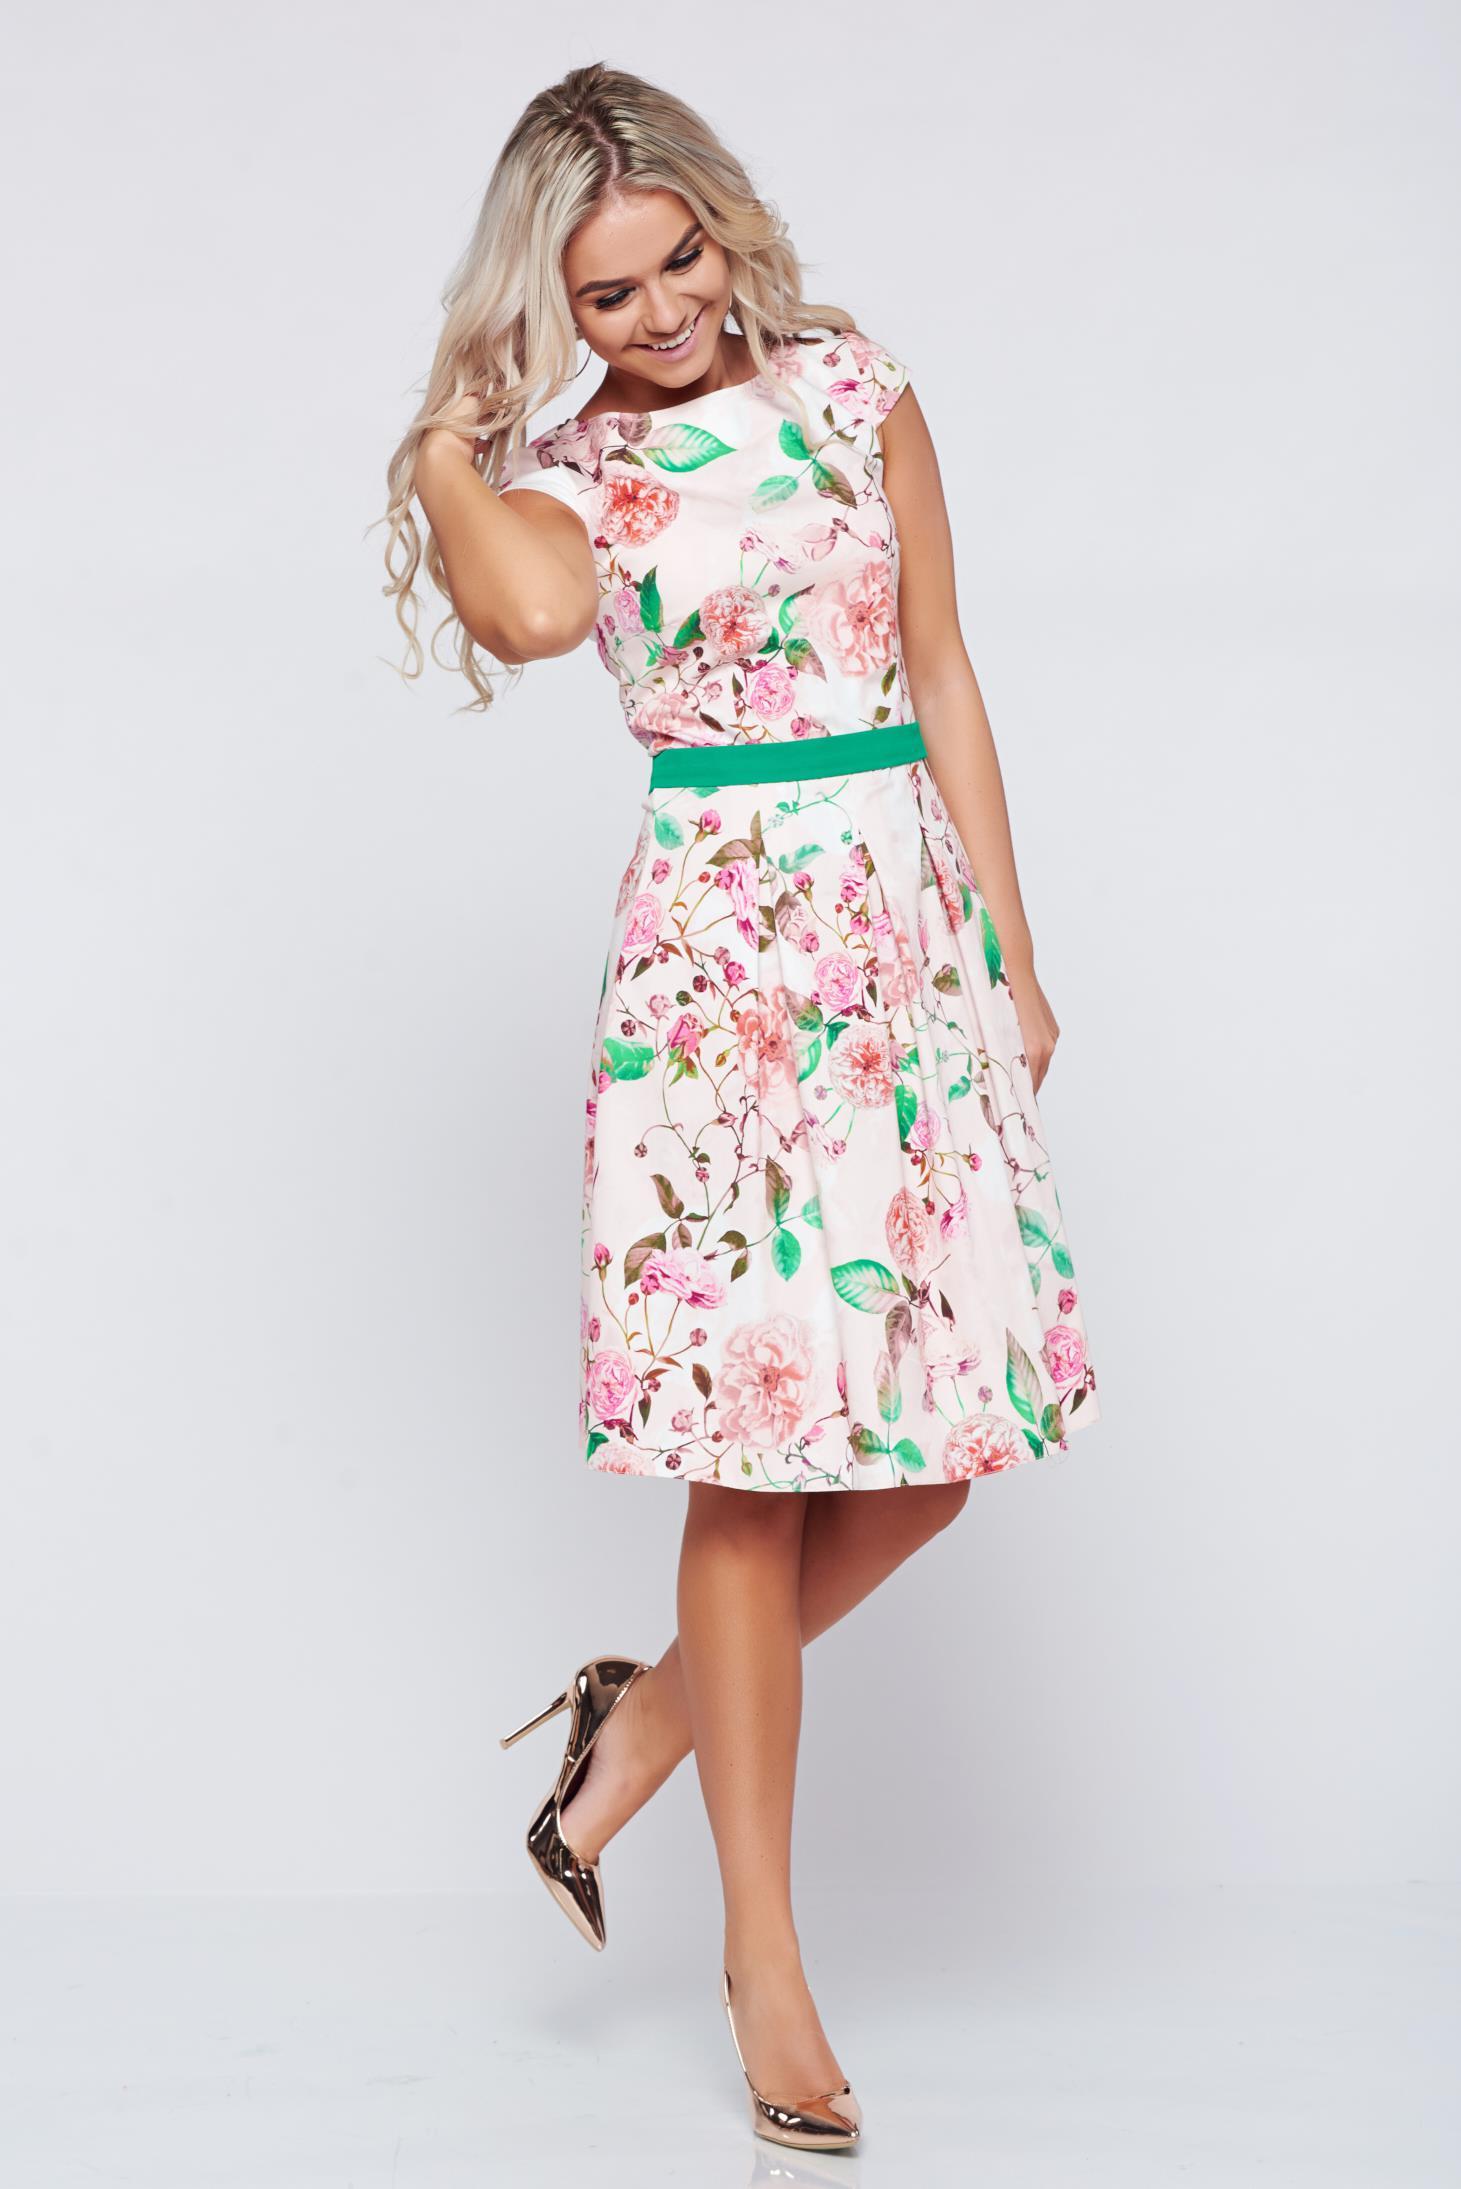 Rochie LaDonna piersica in clos din bumbac cu imprimeuri florale